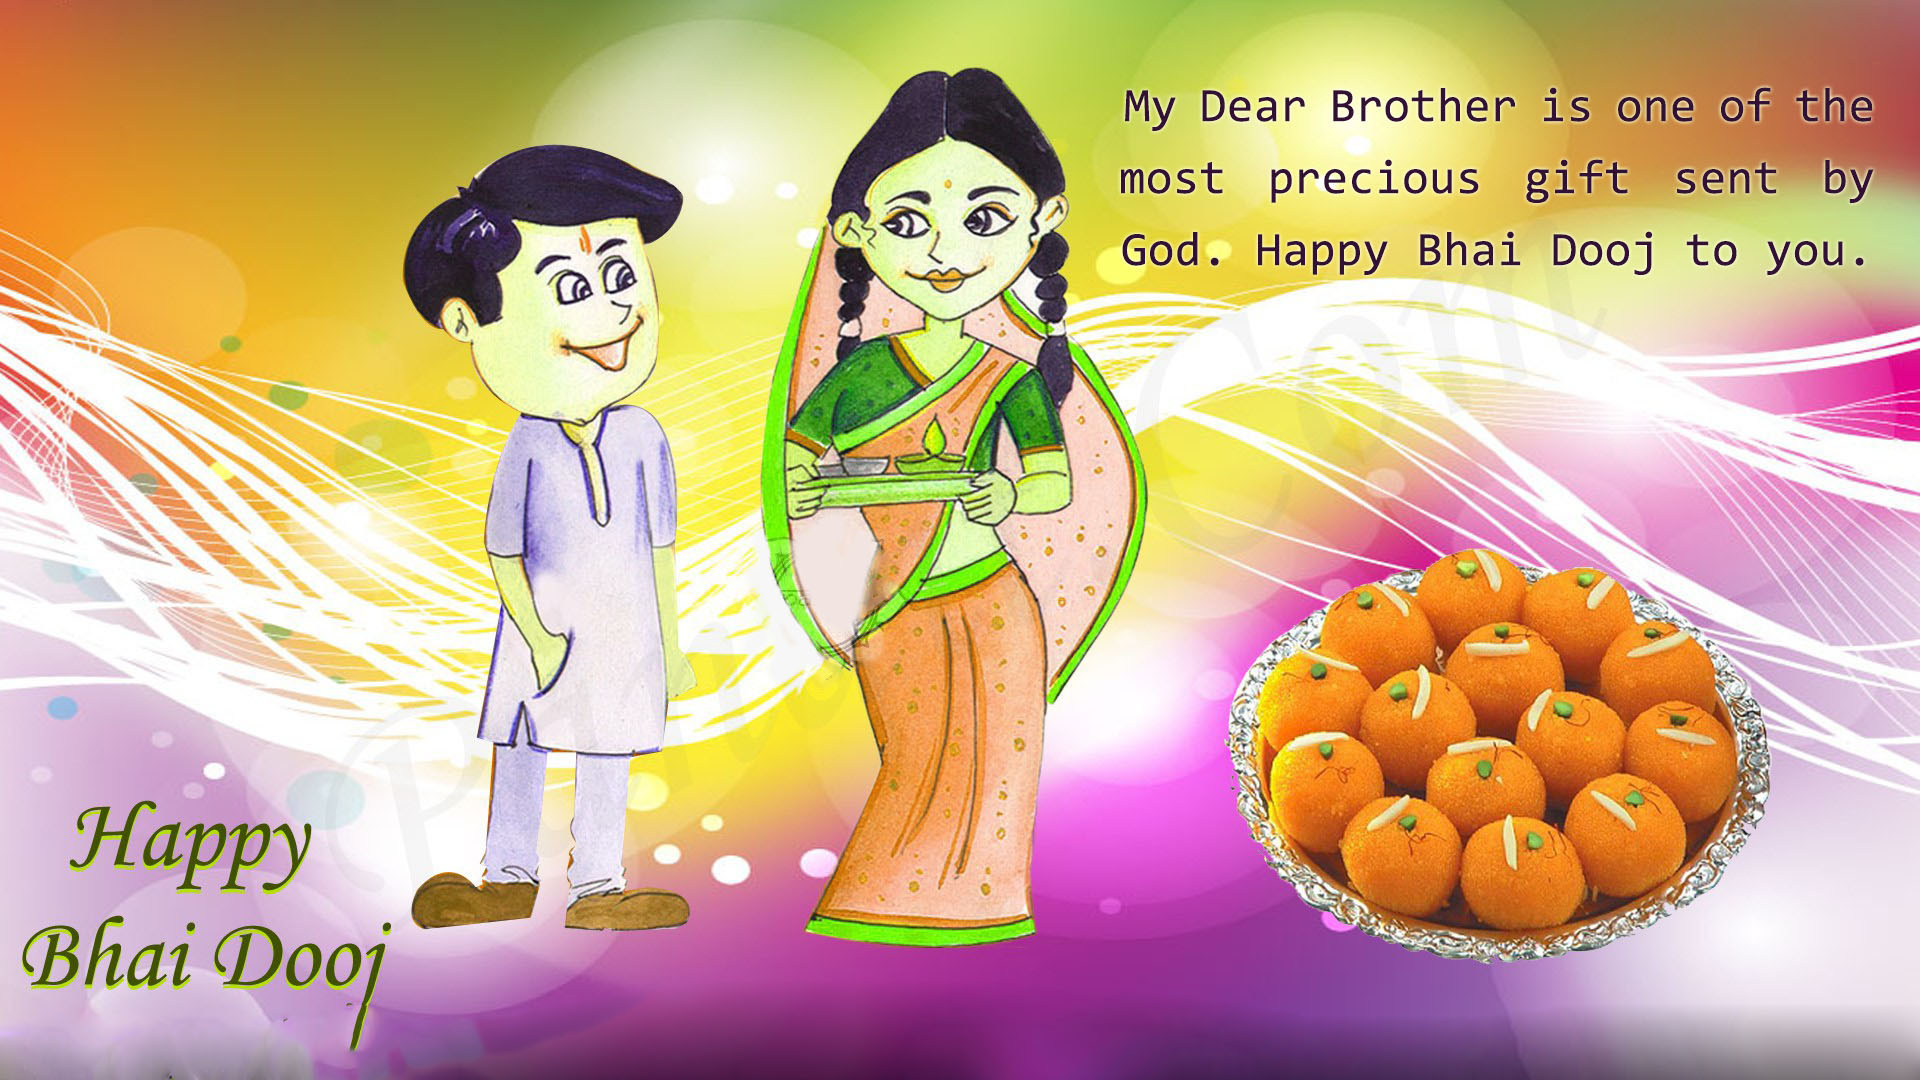 Happy Bhai Dooj Hd Mages